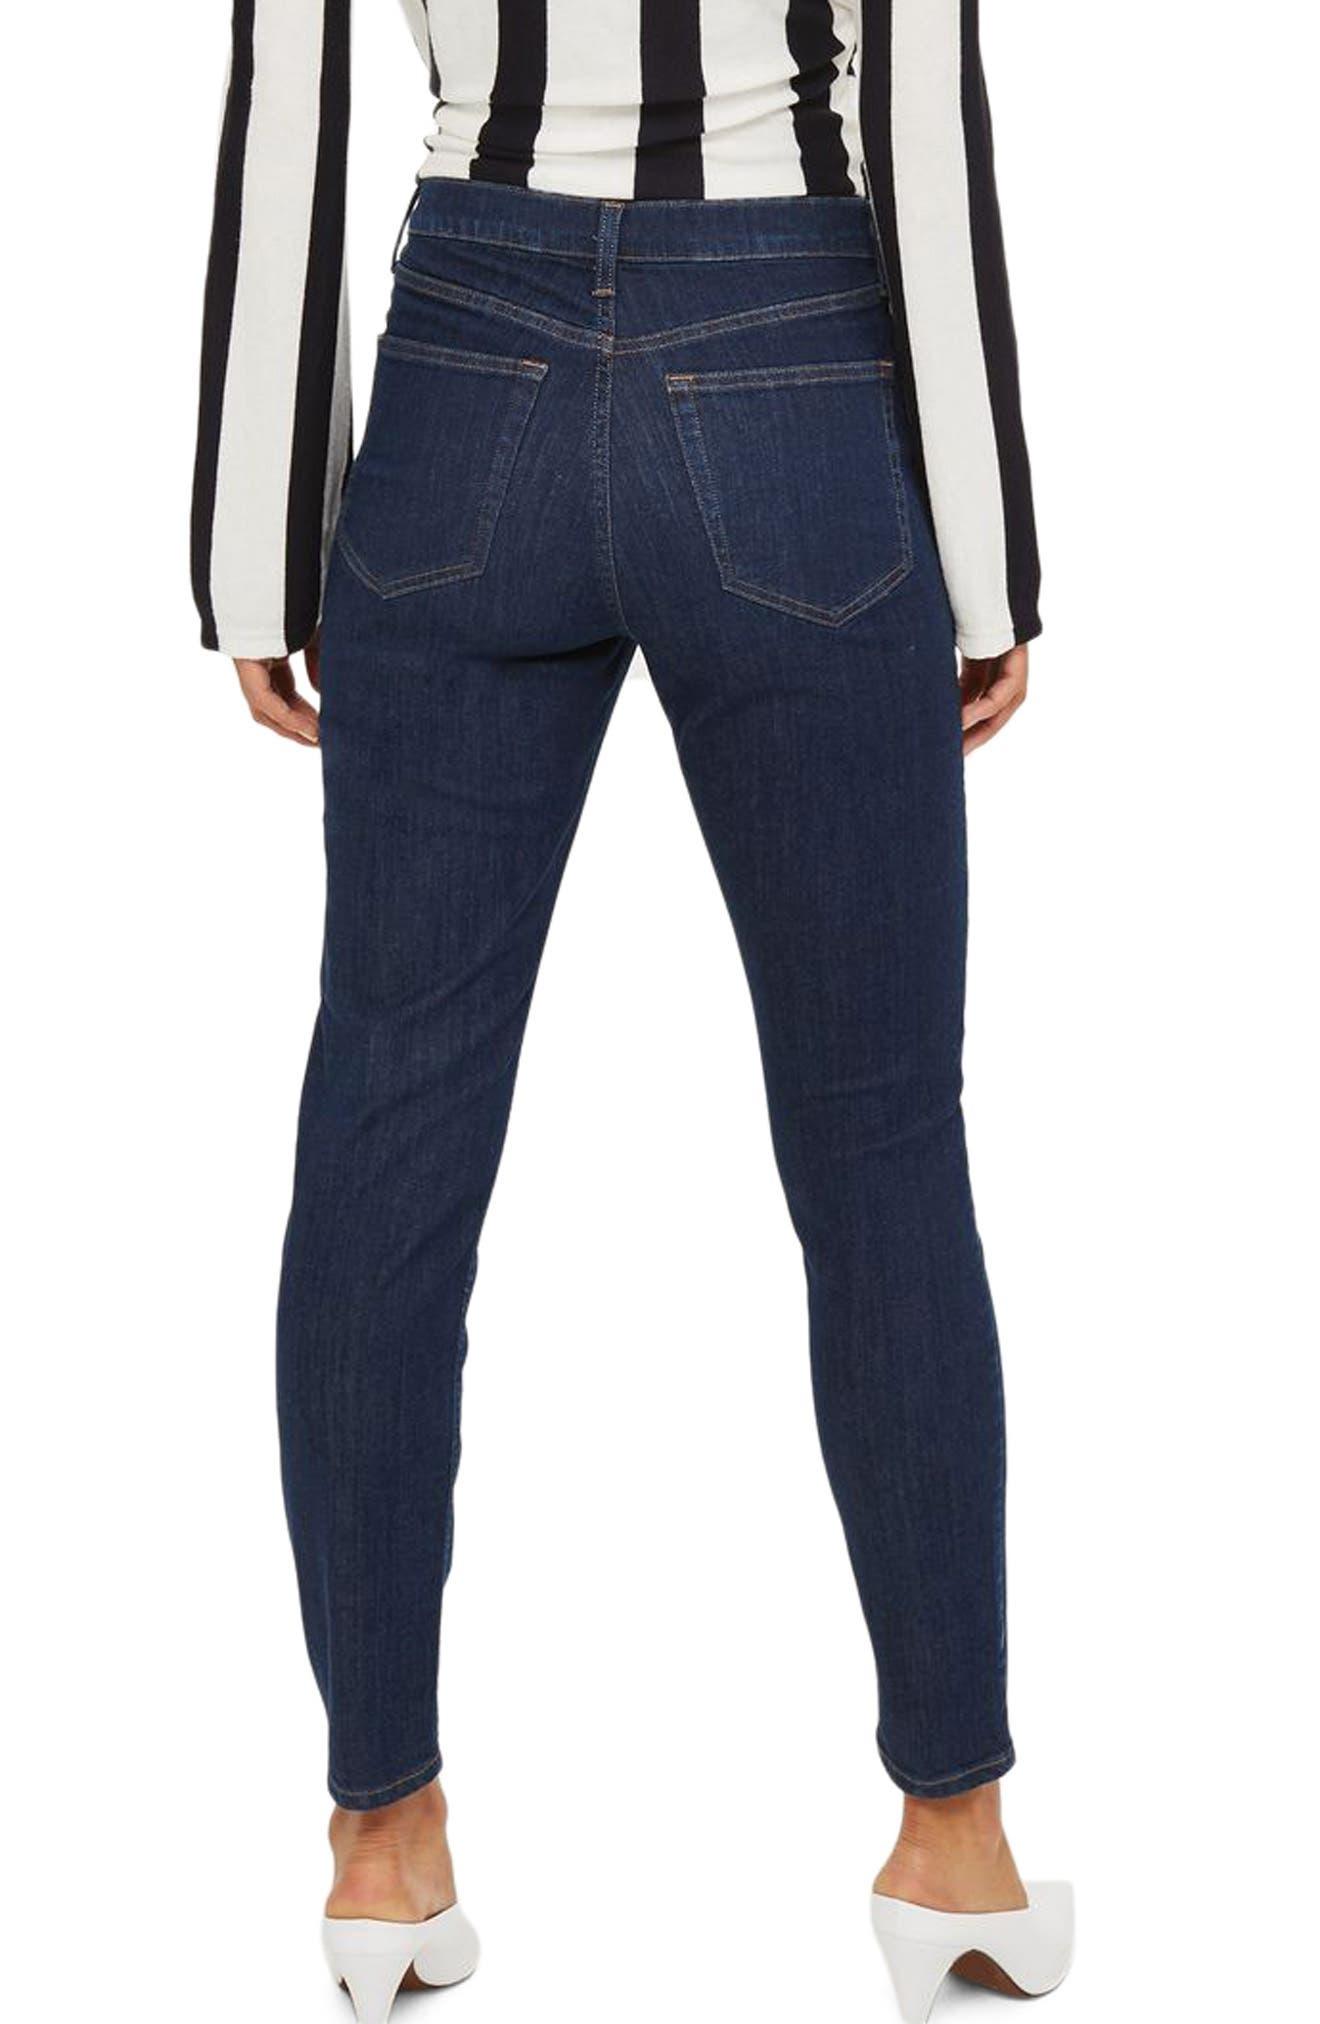 Jamie High Waist Ankle Skinny Jeans,                             Alternate thumbnail 2, color,                             Dark Denim